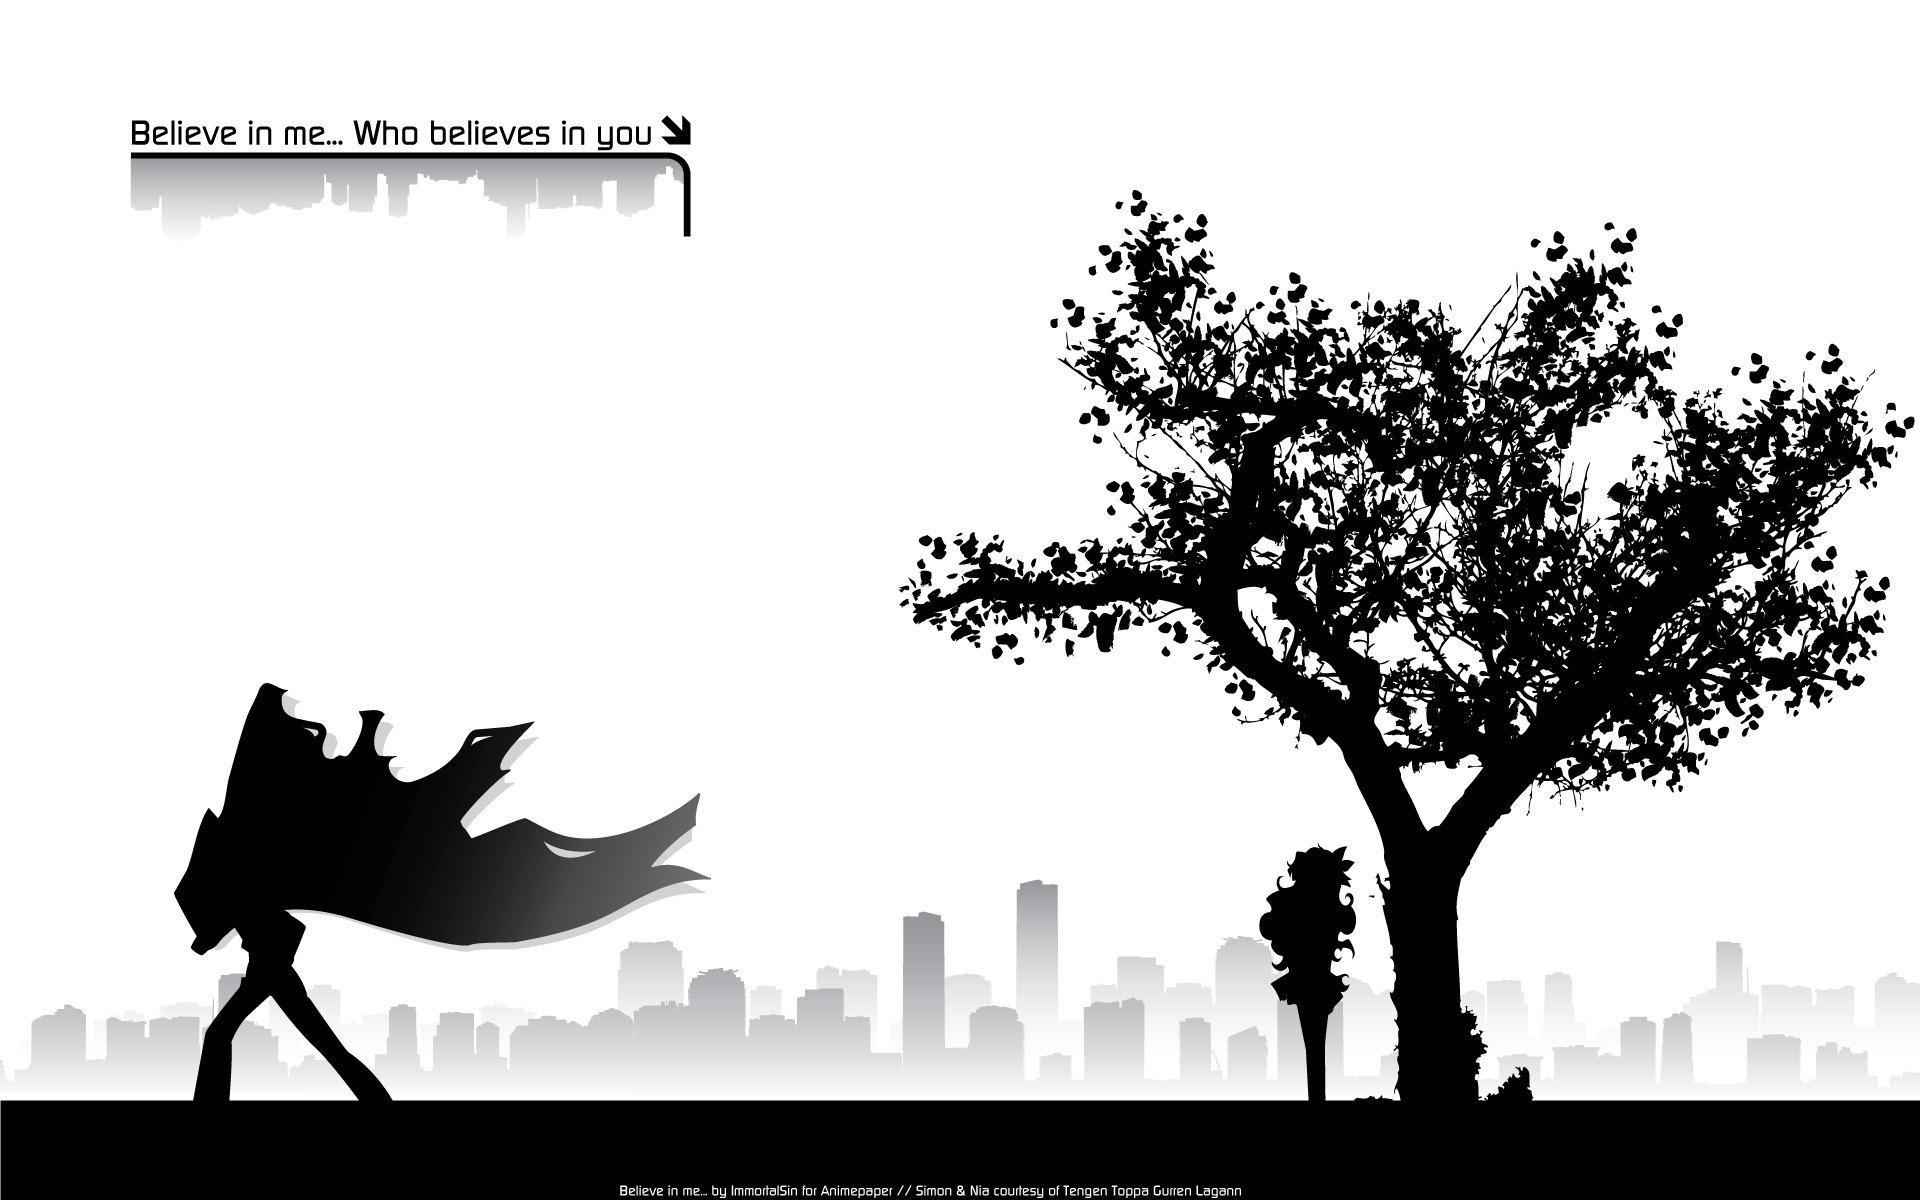 [animepaper.net]wallpaper-art-anime-tengen-toppa-gurren-lagann-believe-in-me...-75799-immortalsin-1920x1200-af13f760.jpg